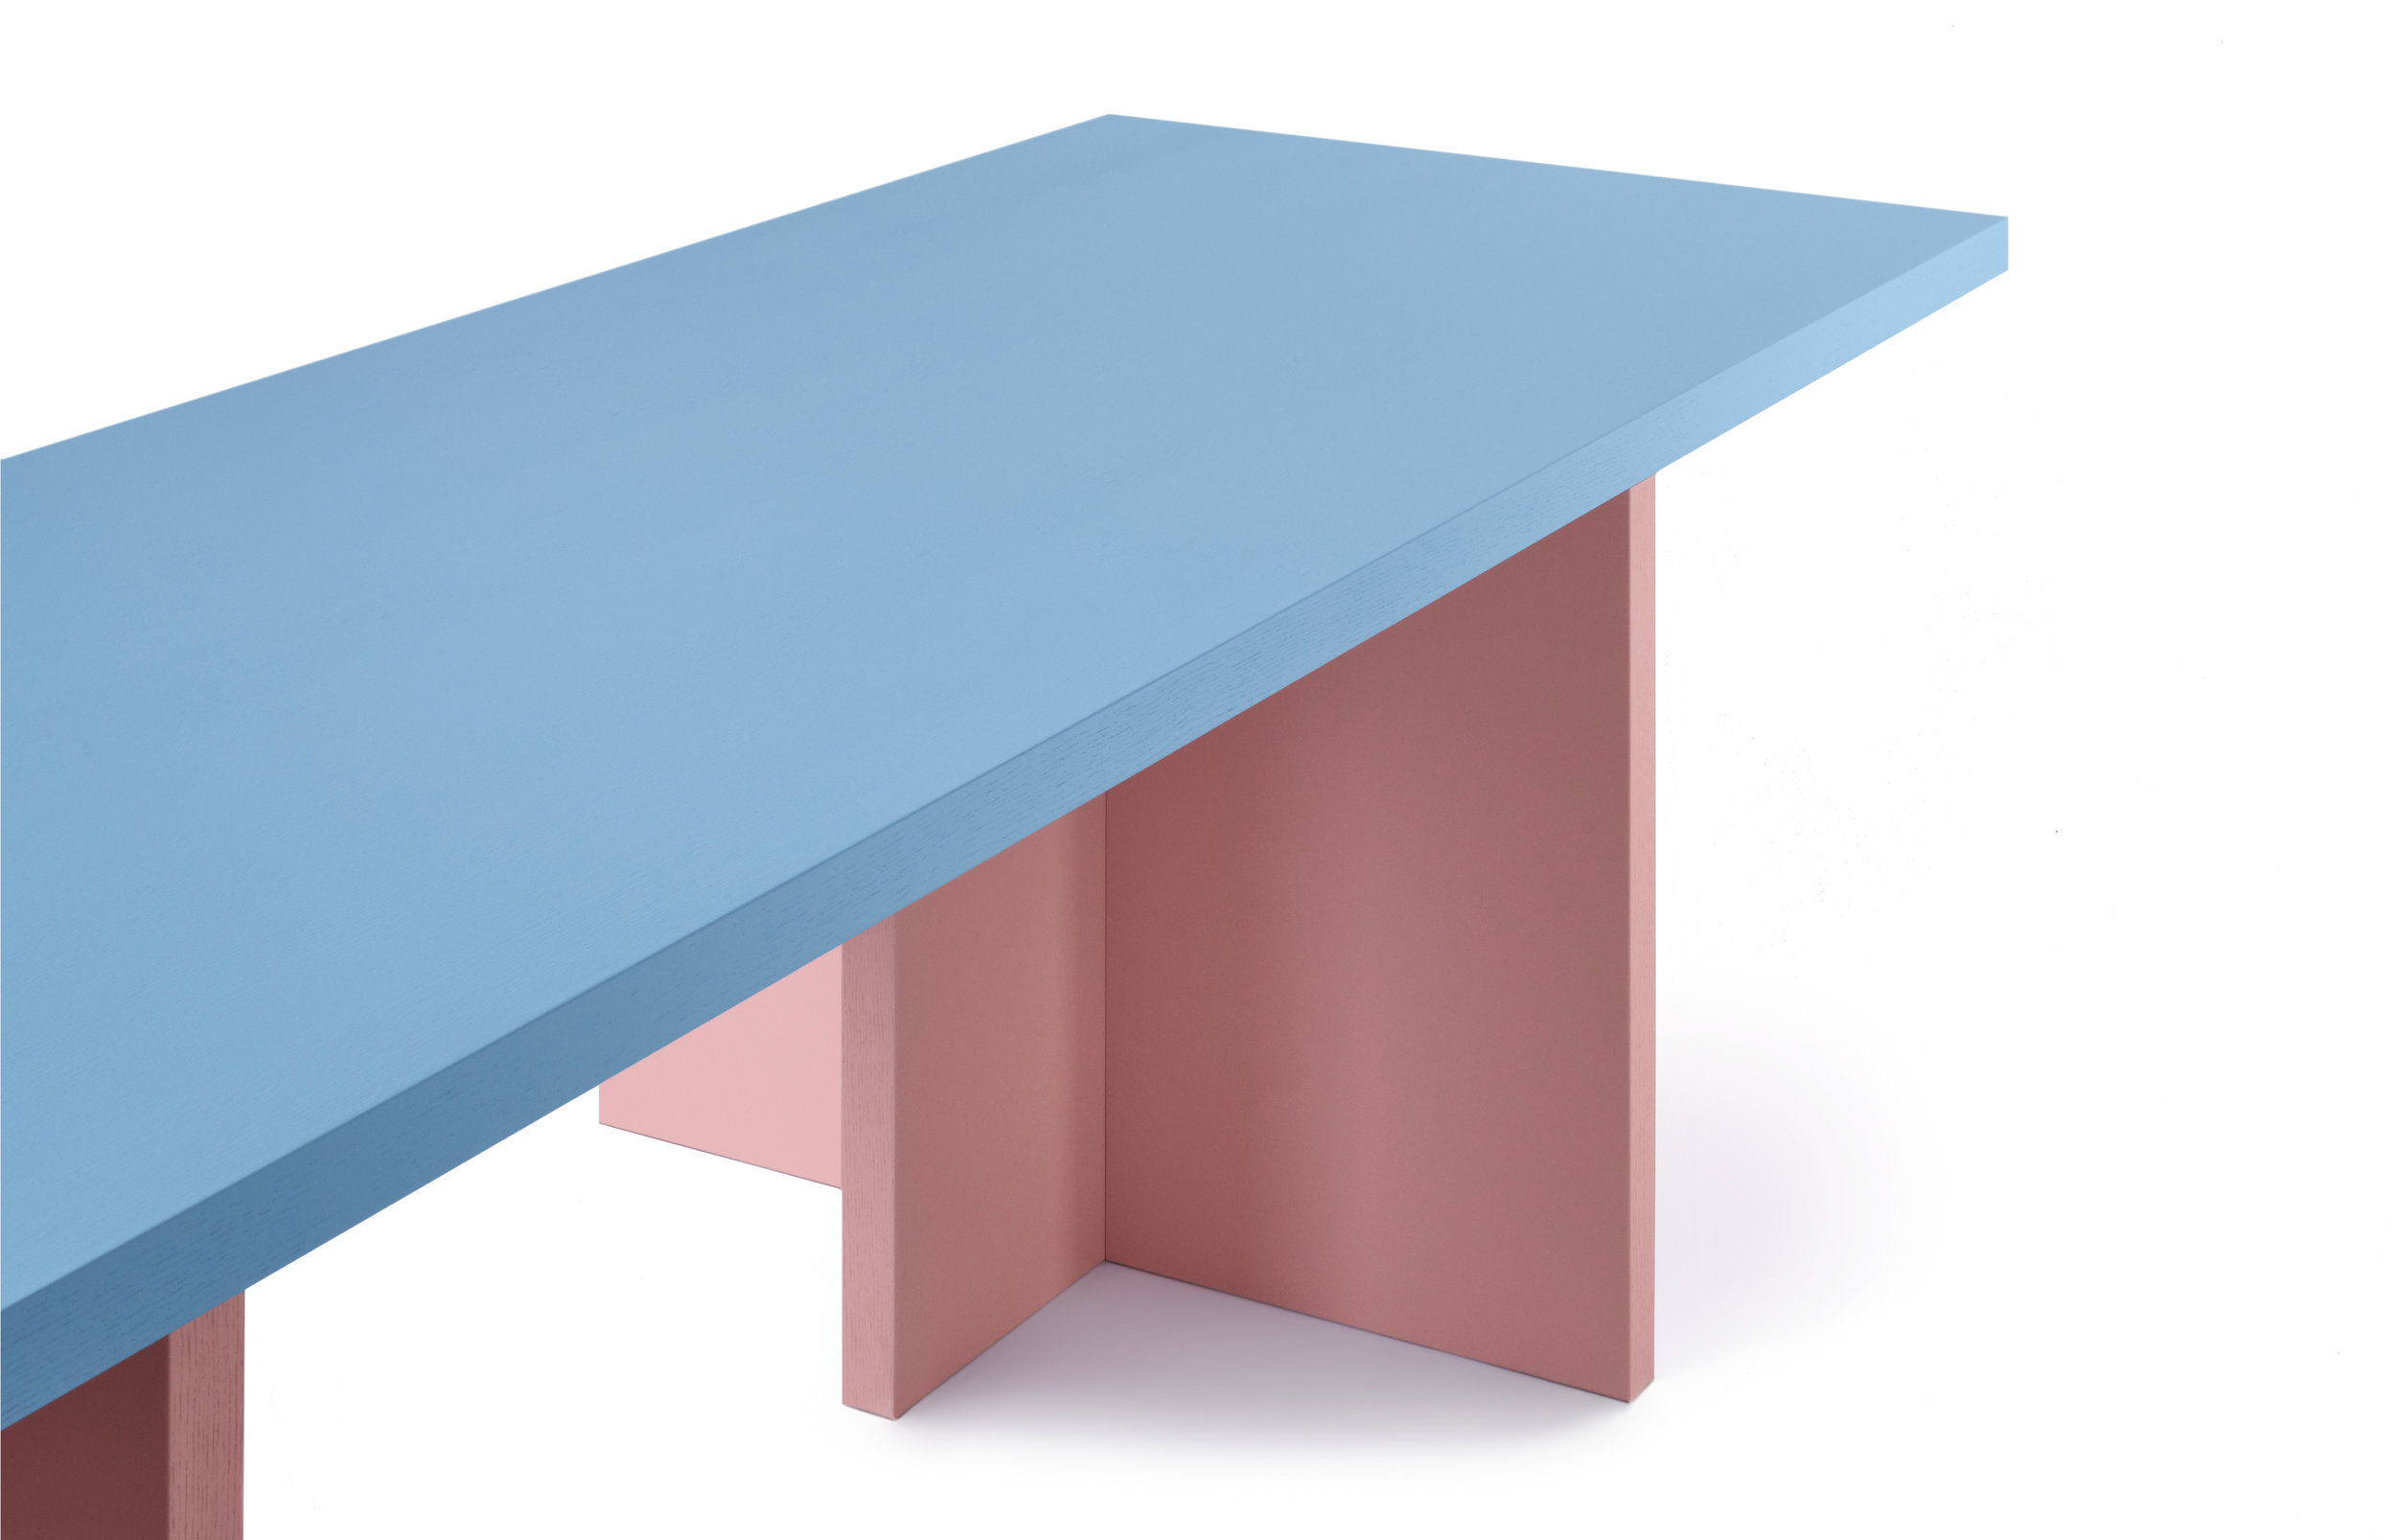 ELIO table / Pic by Ragnar Schmu